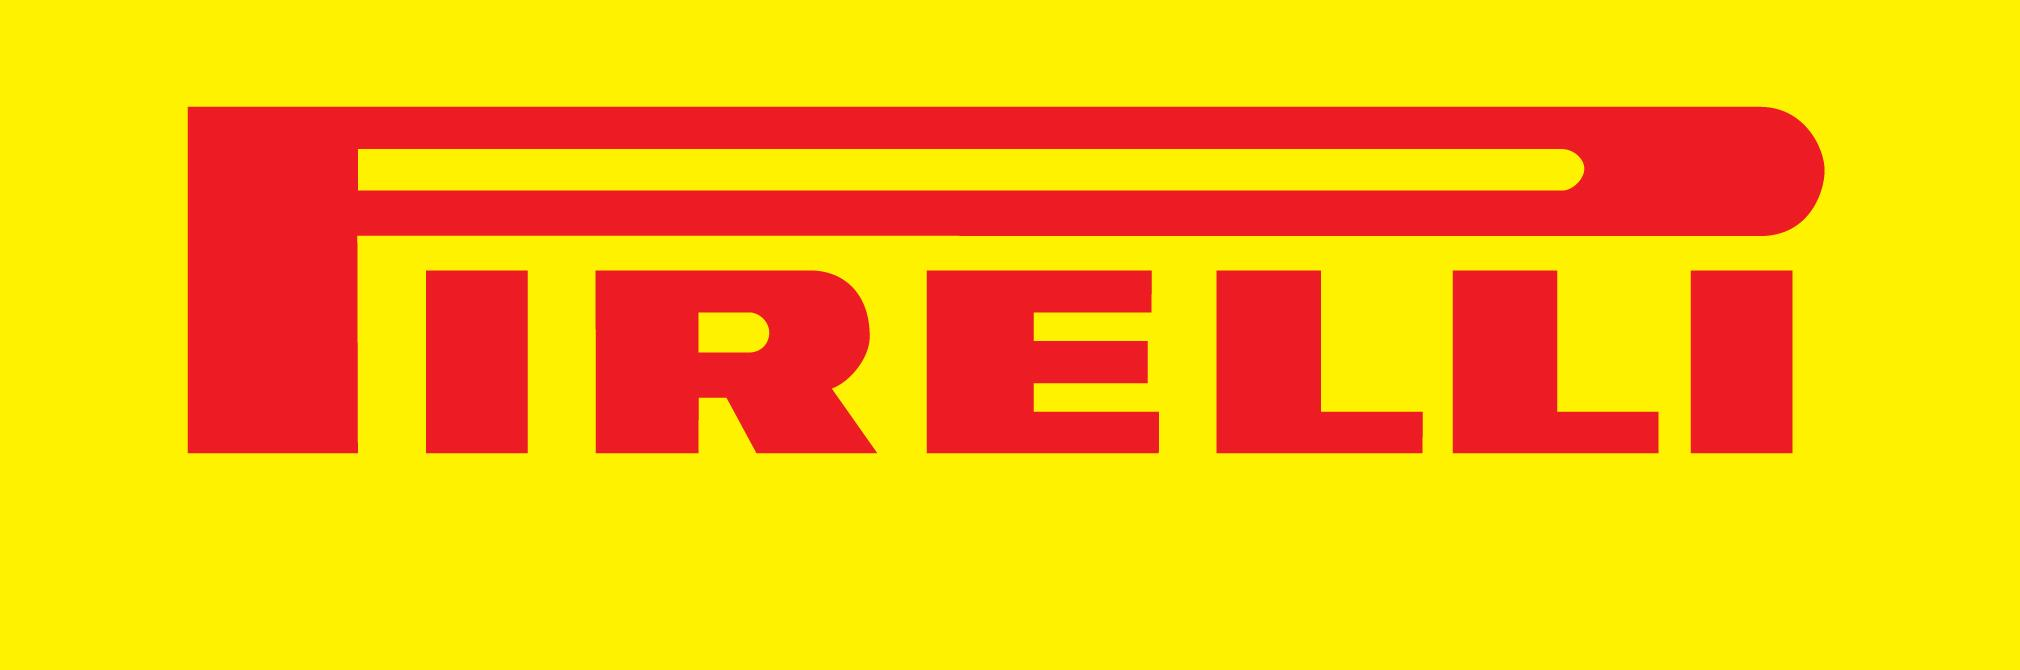 logo pirelli edit